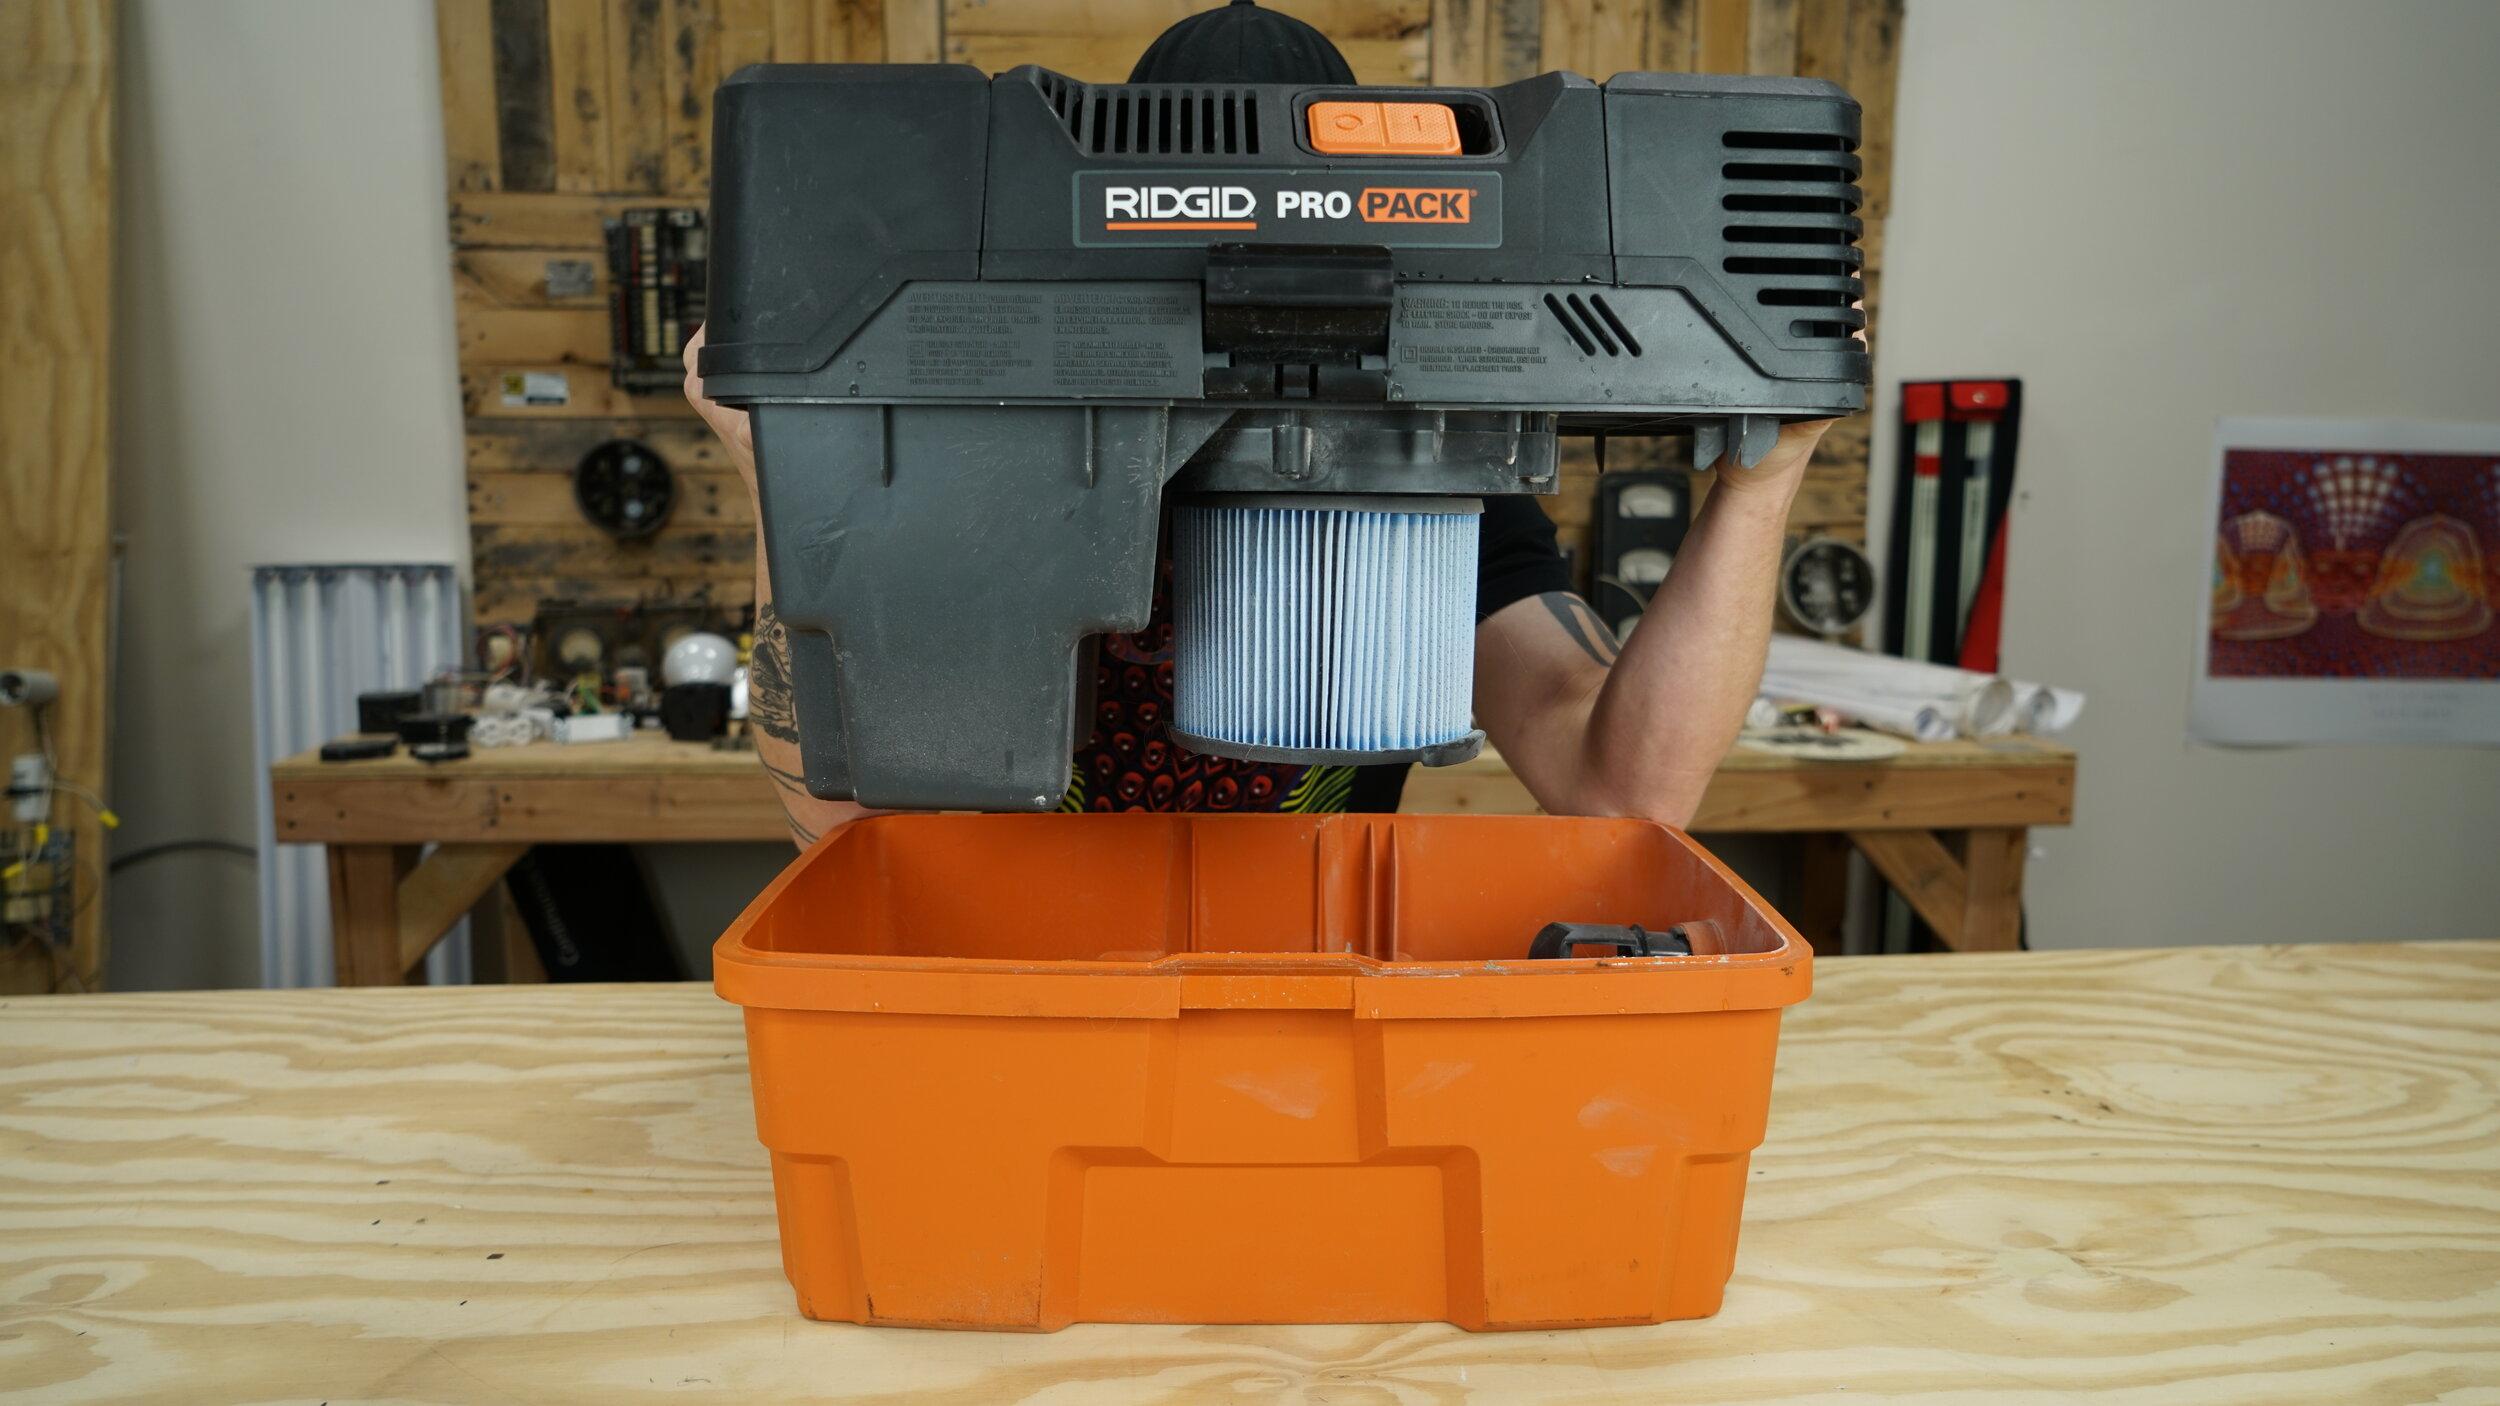 ridgid-5hp-portable-wet-dry-vac.JPG